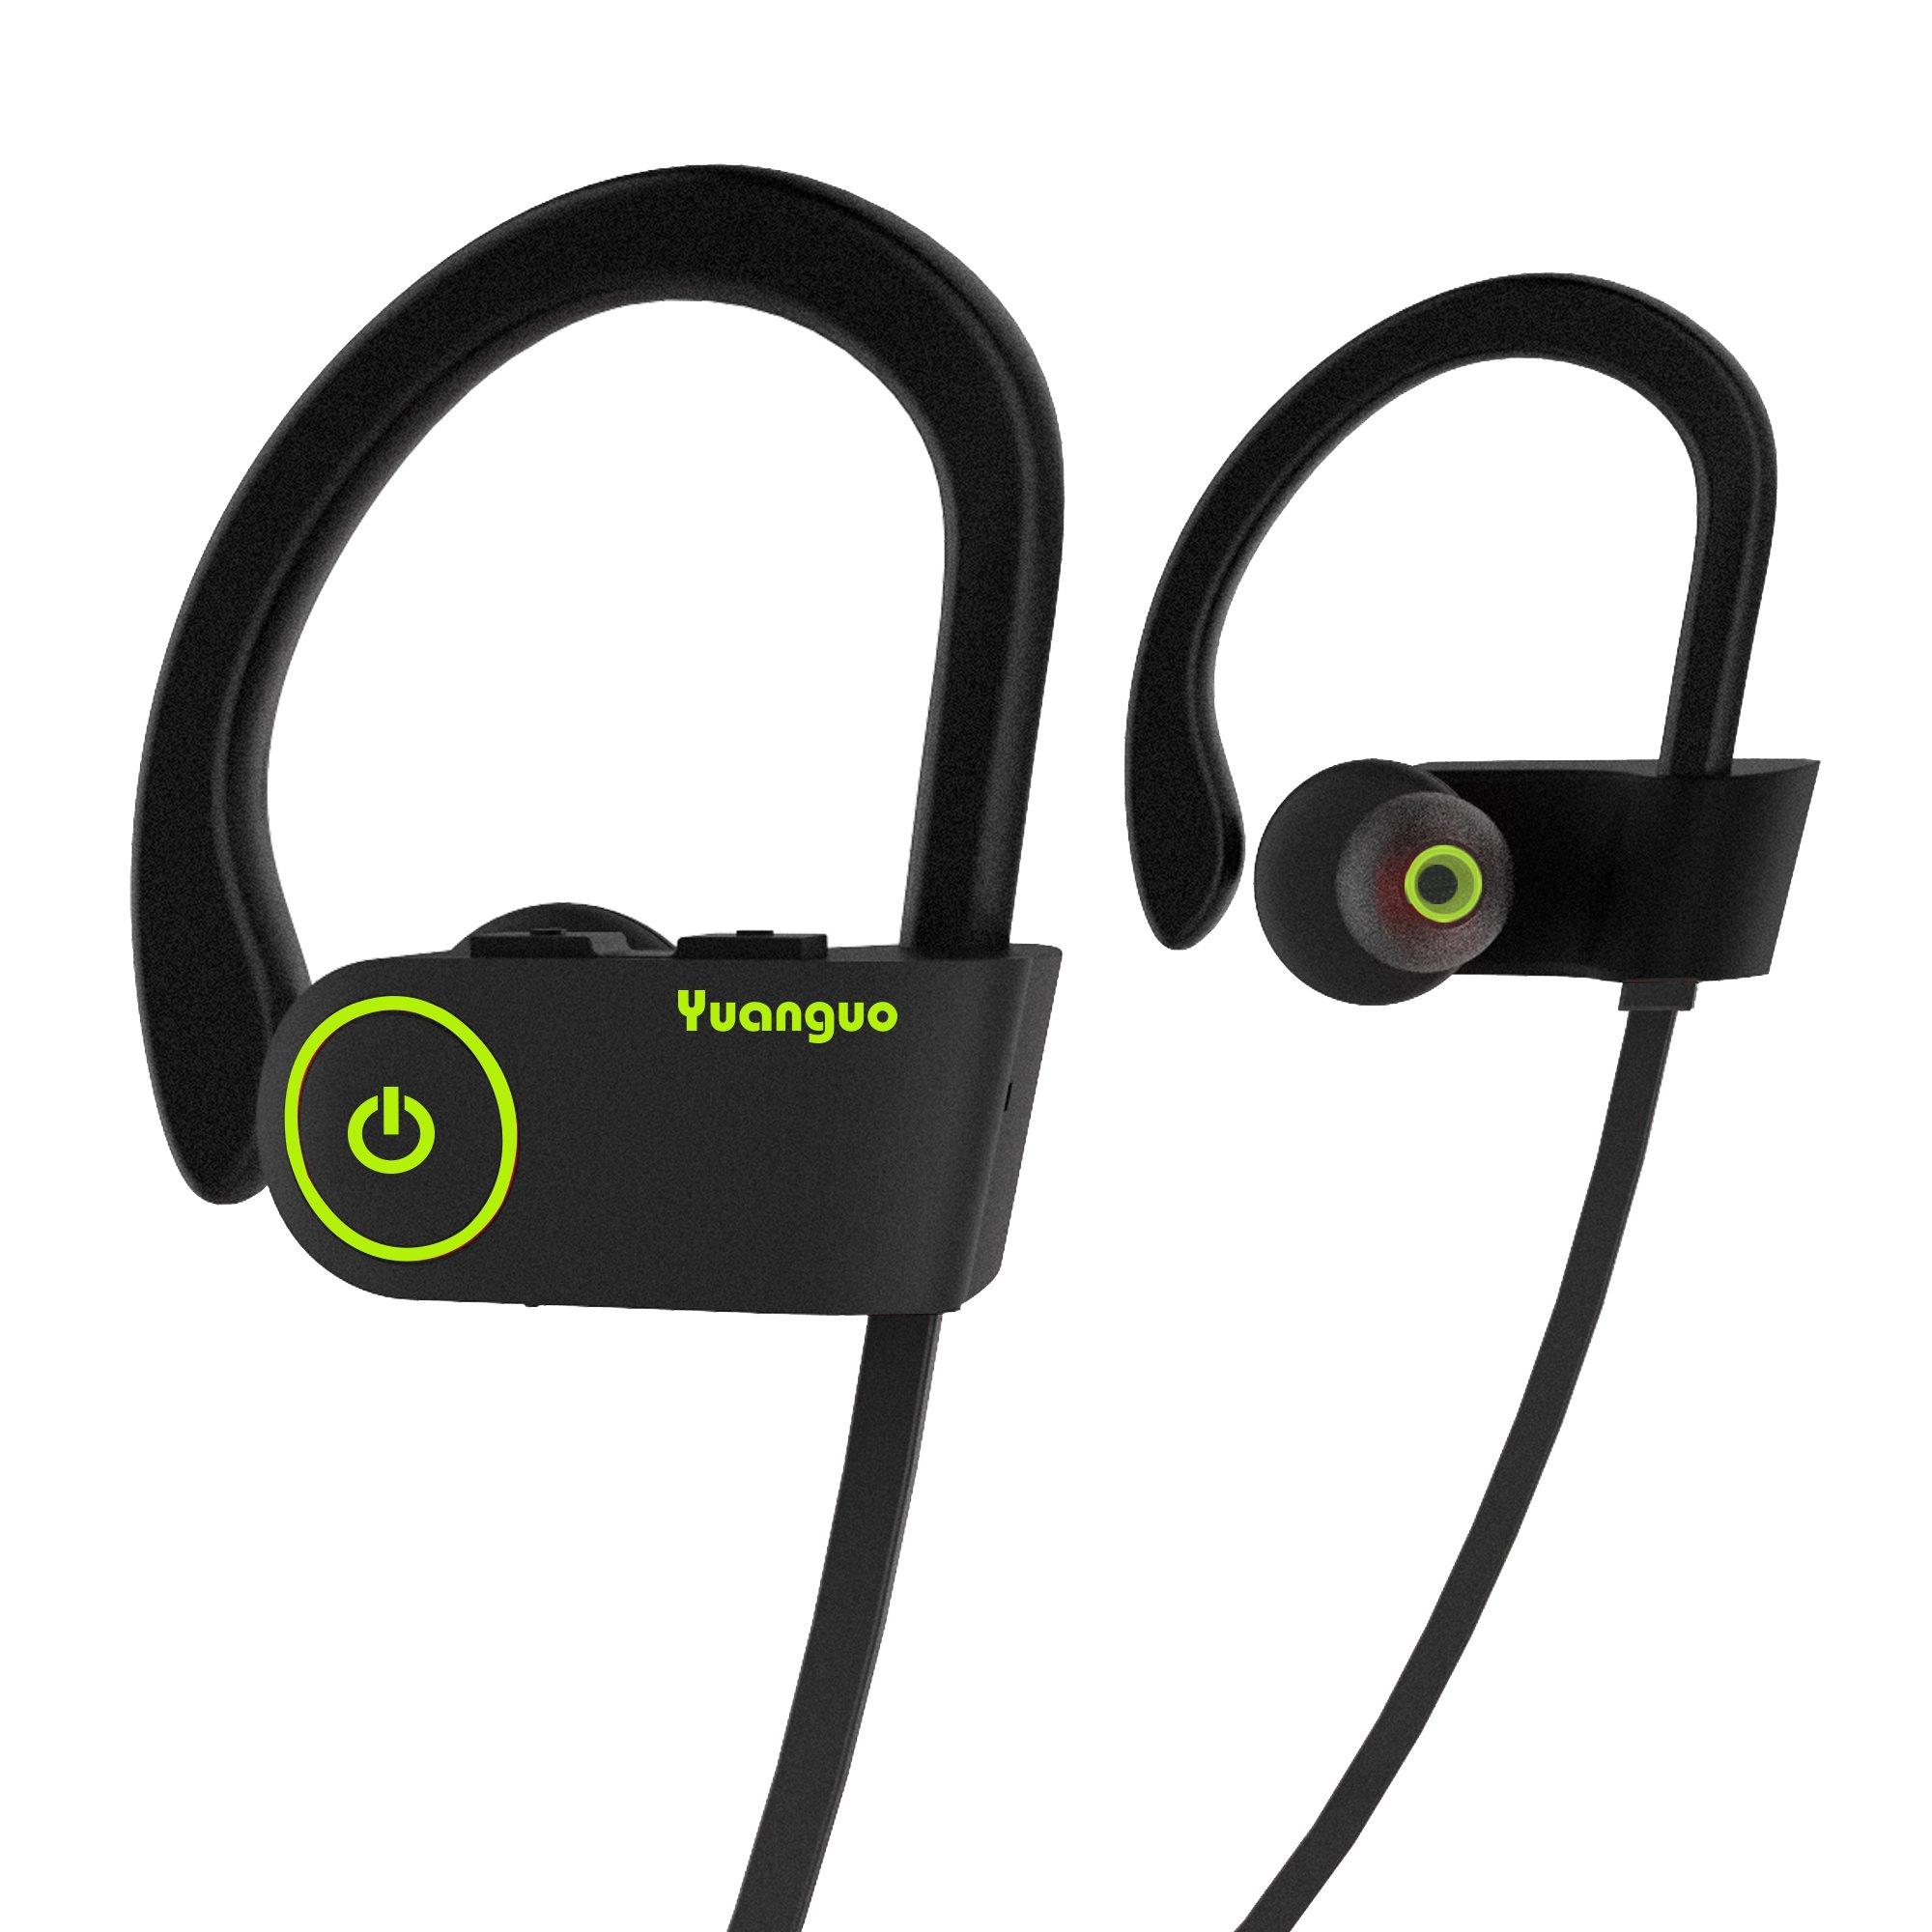 Auricolari Bluetooth HolyHigh cuffie sportive resistenti all acqua  Waterproof standard senza fili con Microfono a 18c303888a0e